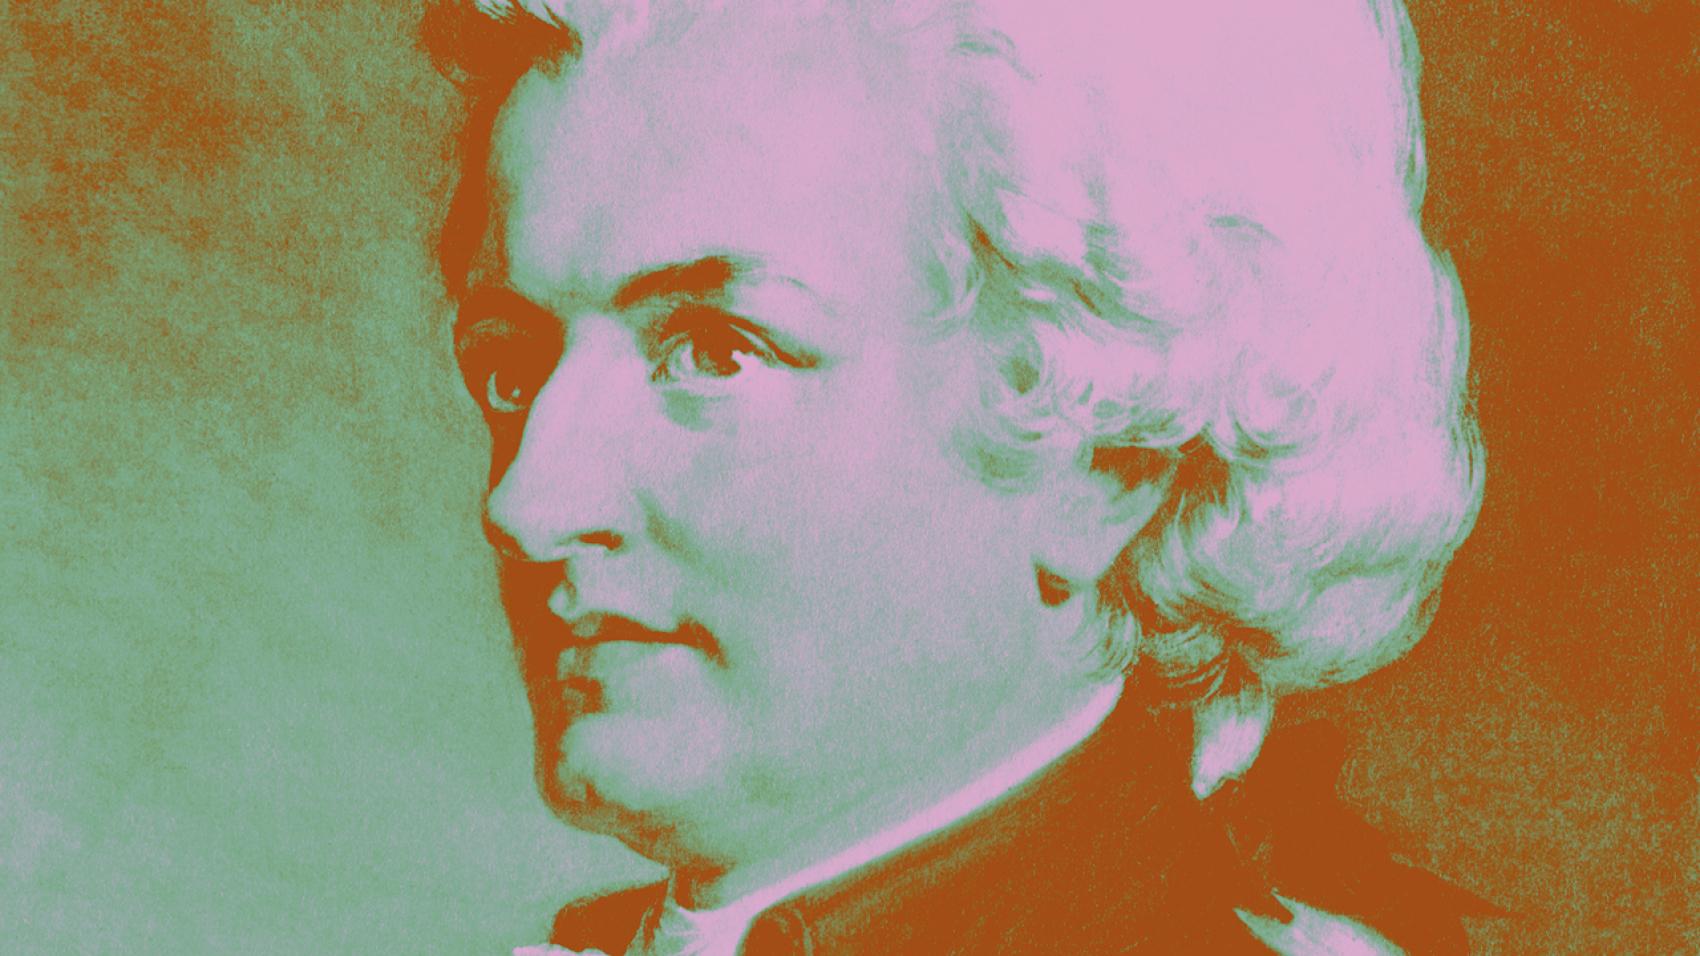 Netherlands Chamber Orchestra plays Mozart and Tchaikovsky